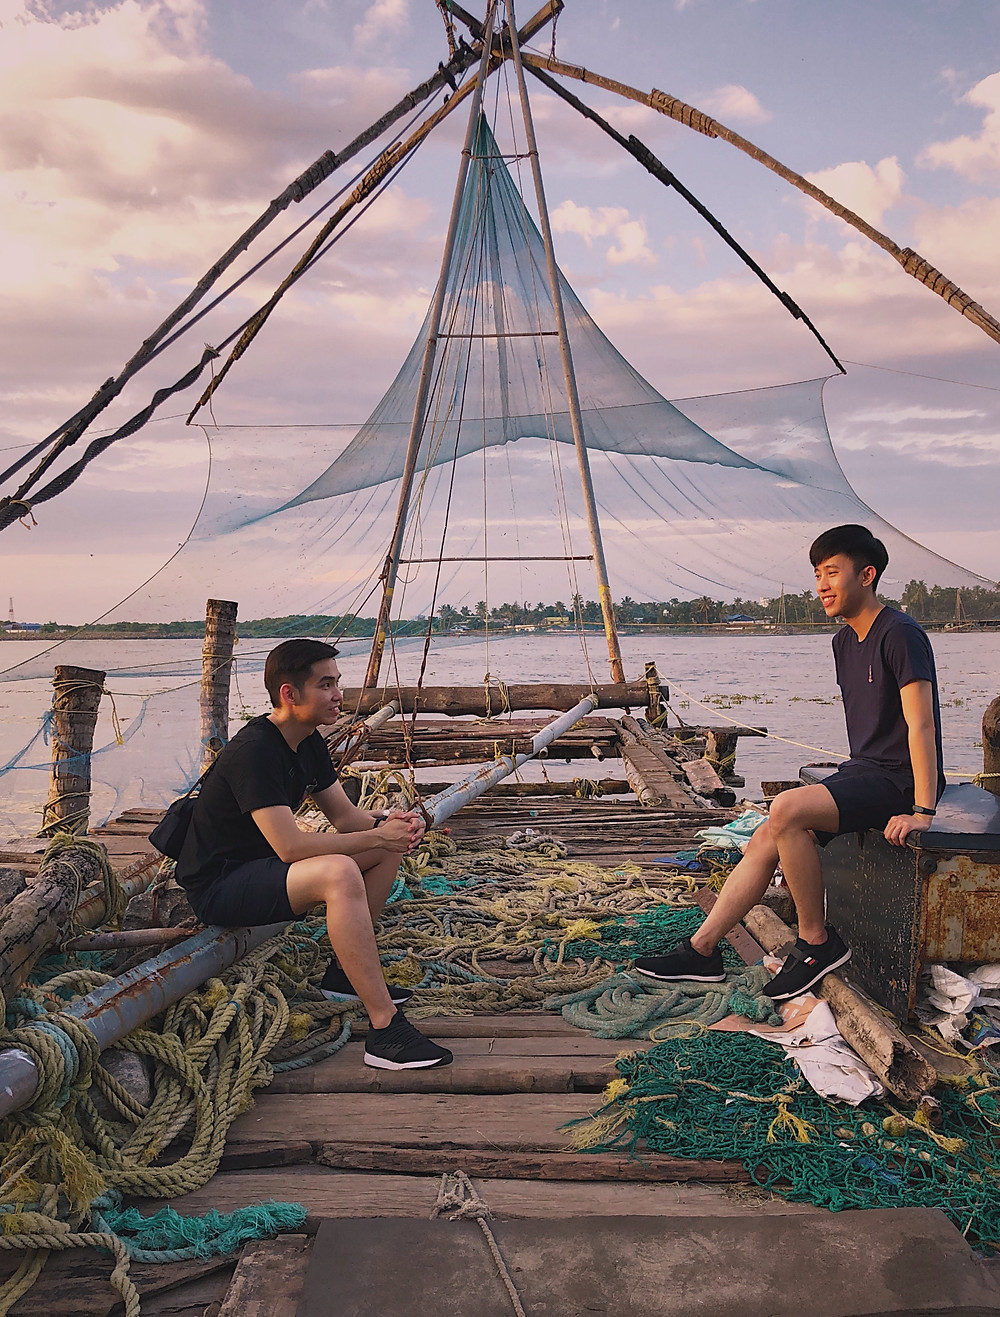 Chinese Fishing Nets in Fort Kochi, Kerala, India